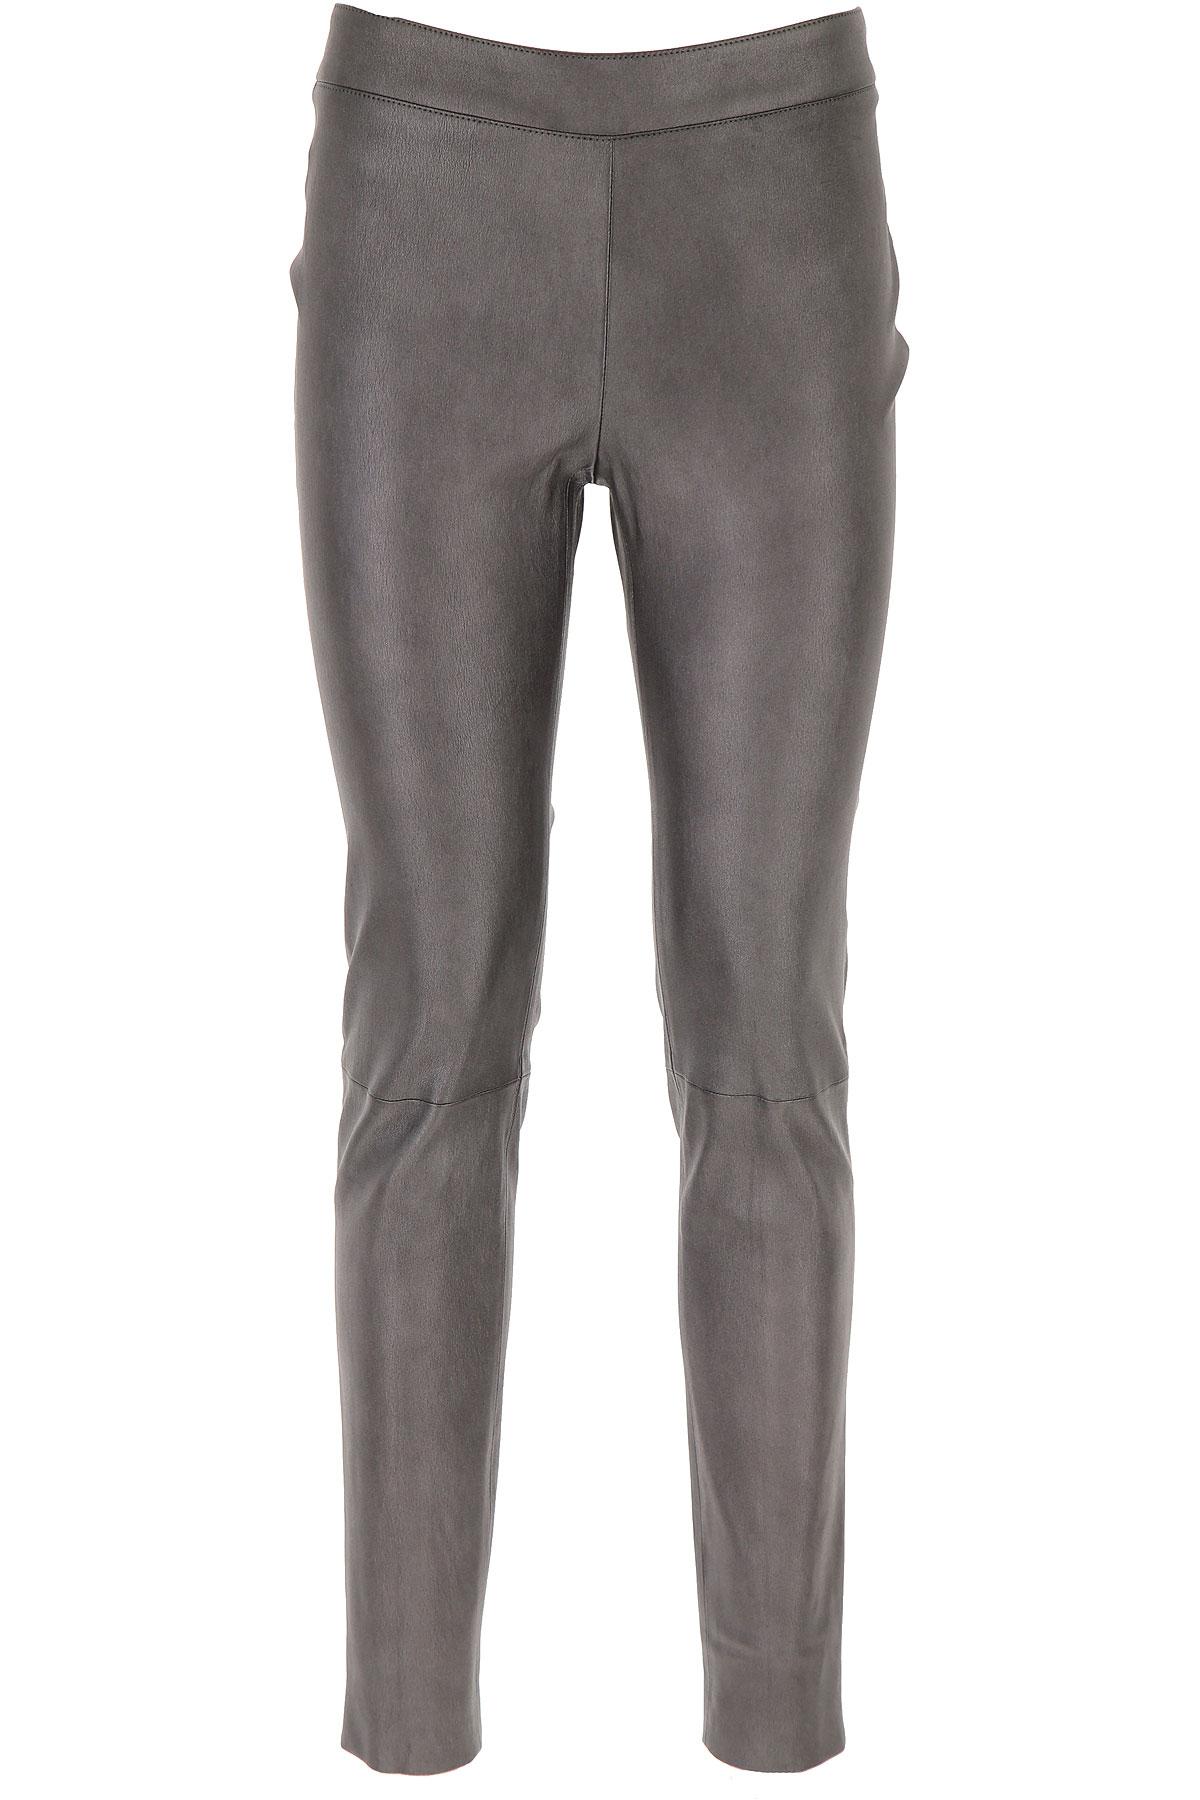 Fabiana Filippi Pants for Women On Sale, Metallic Grey, Leather, 2019, 26 28 30